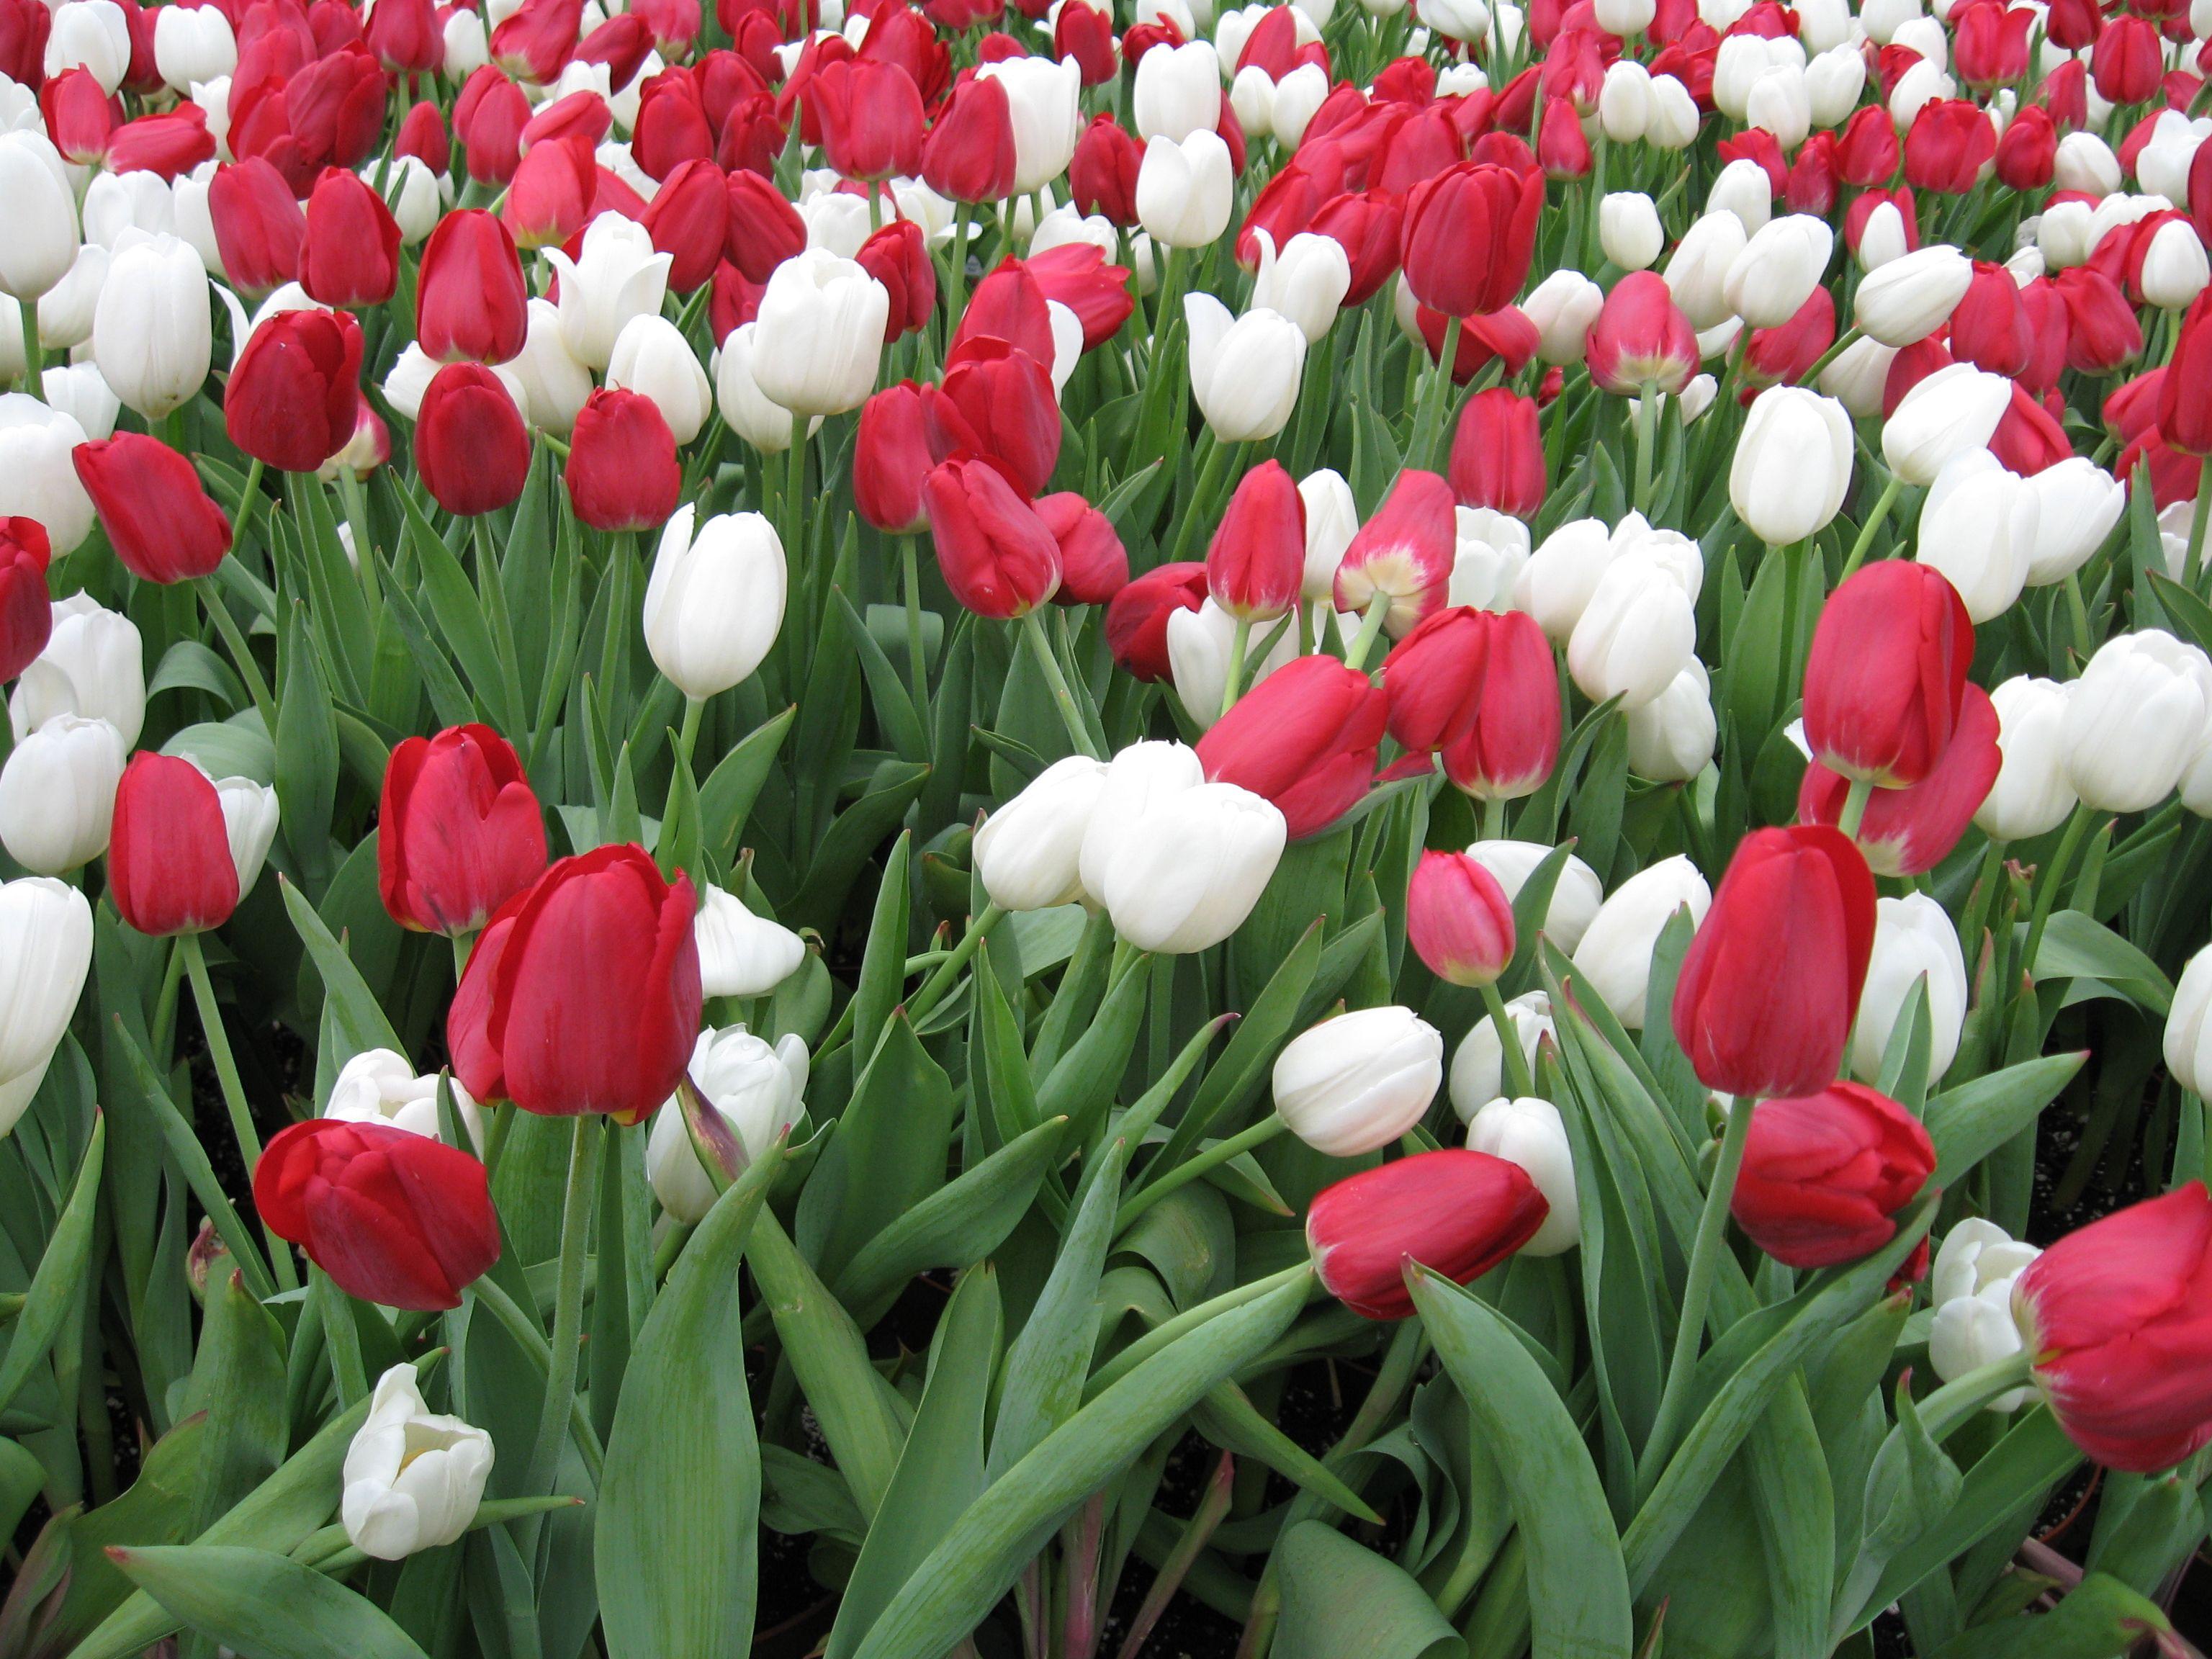 Tulips during the Tulip Festival in Ottawa